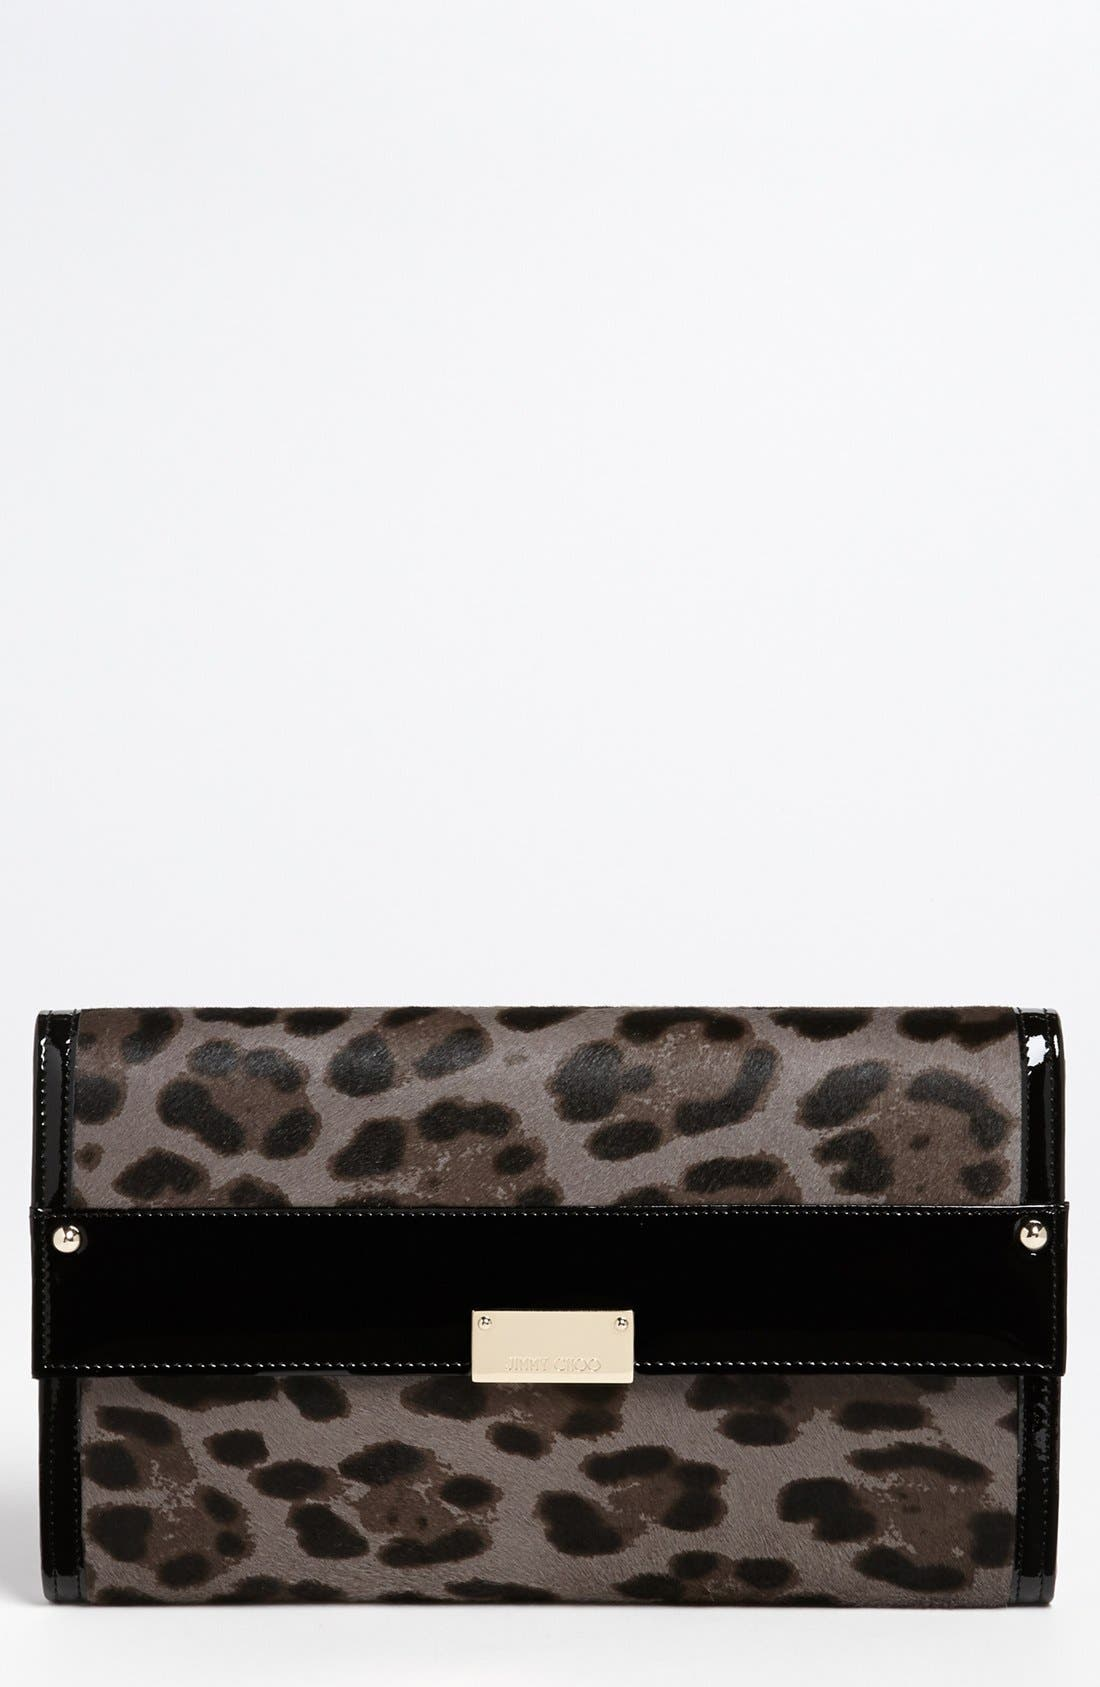 Main Image - Jimmy Choo 'Reese - Extra Large' Leopard Print Calf Hair Clutch